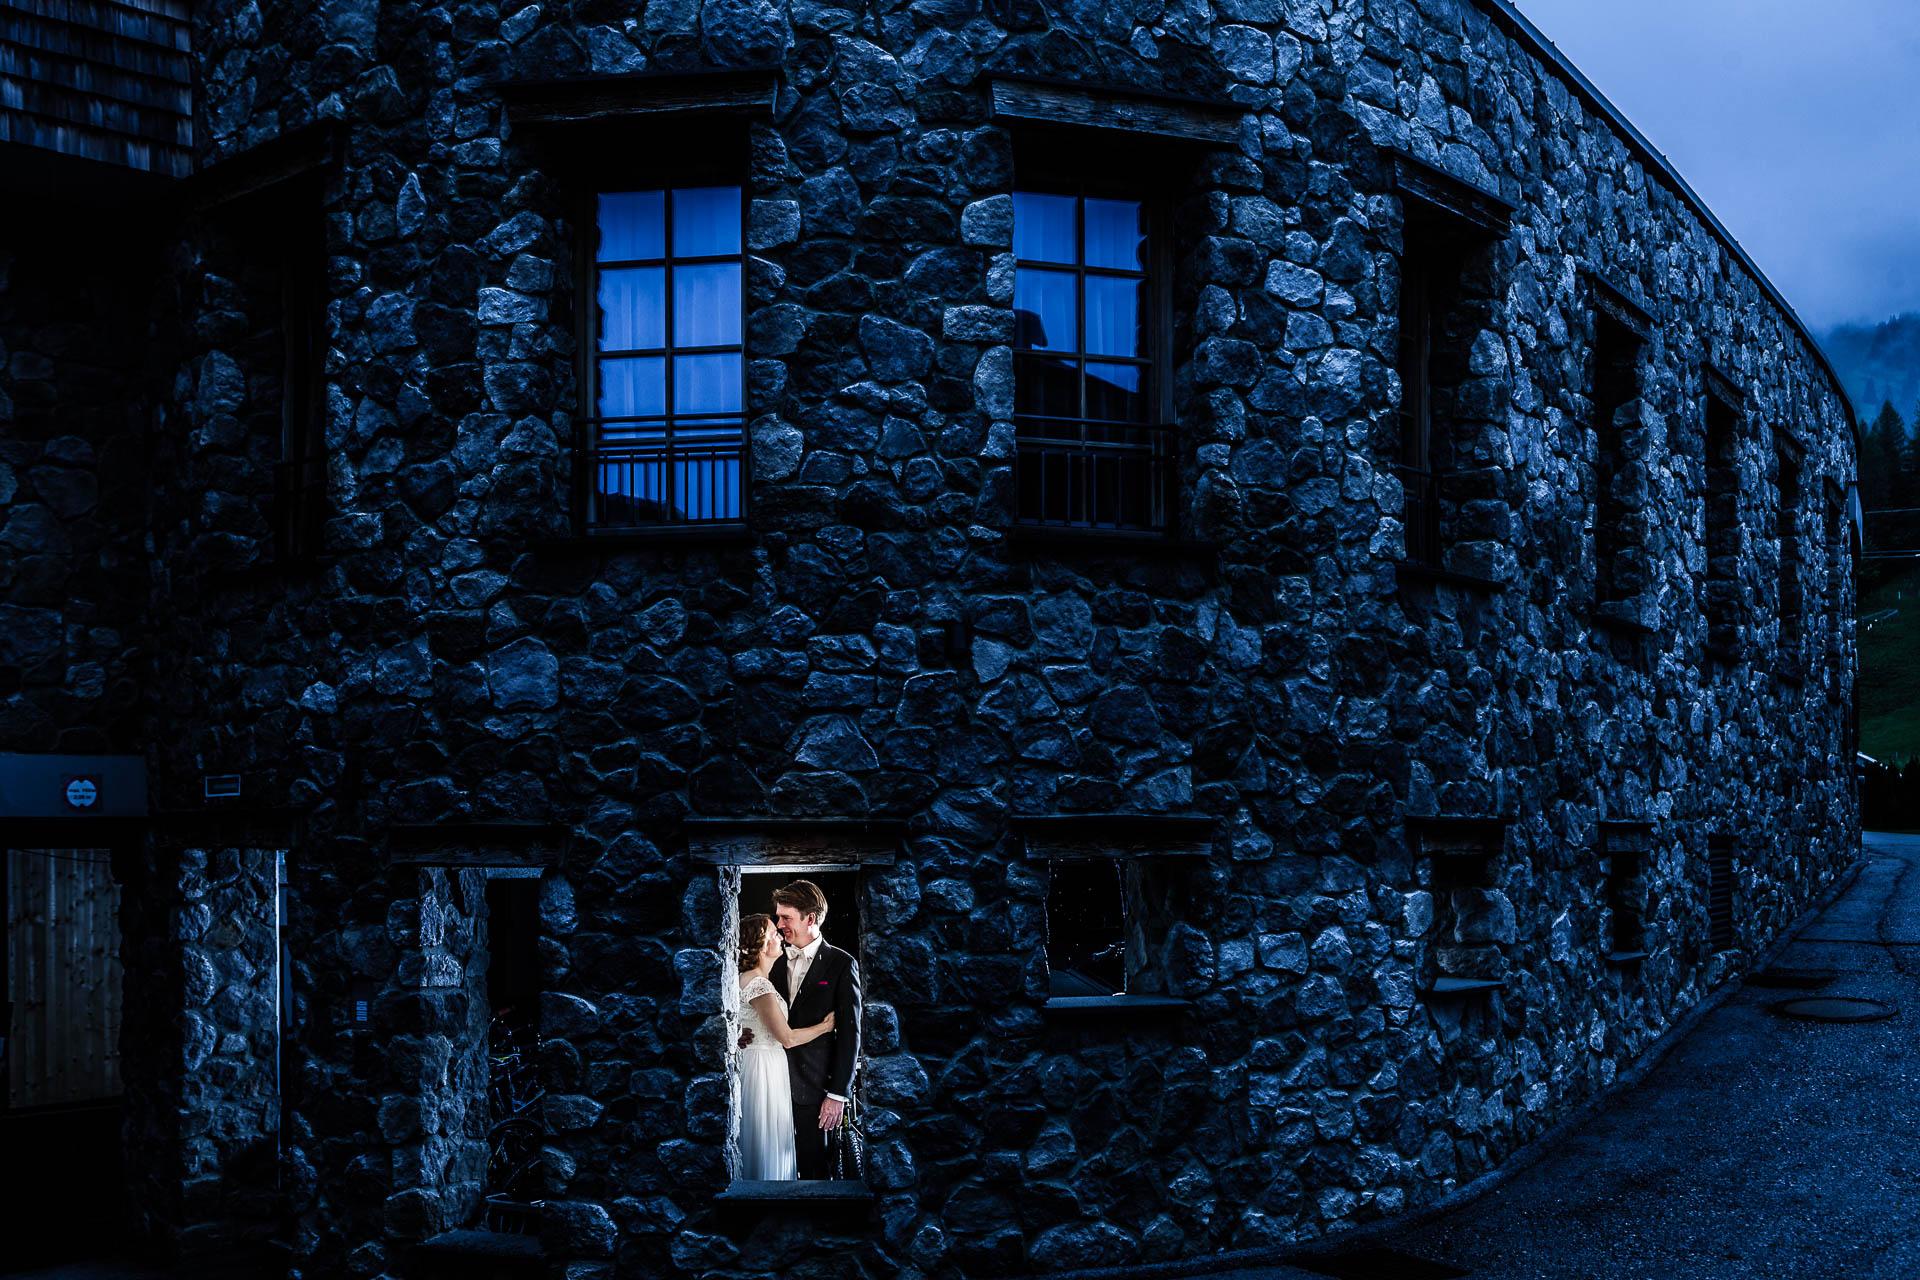 Flath-Hochzeit-Maierl-Alm-Felsch-4718